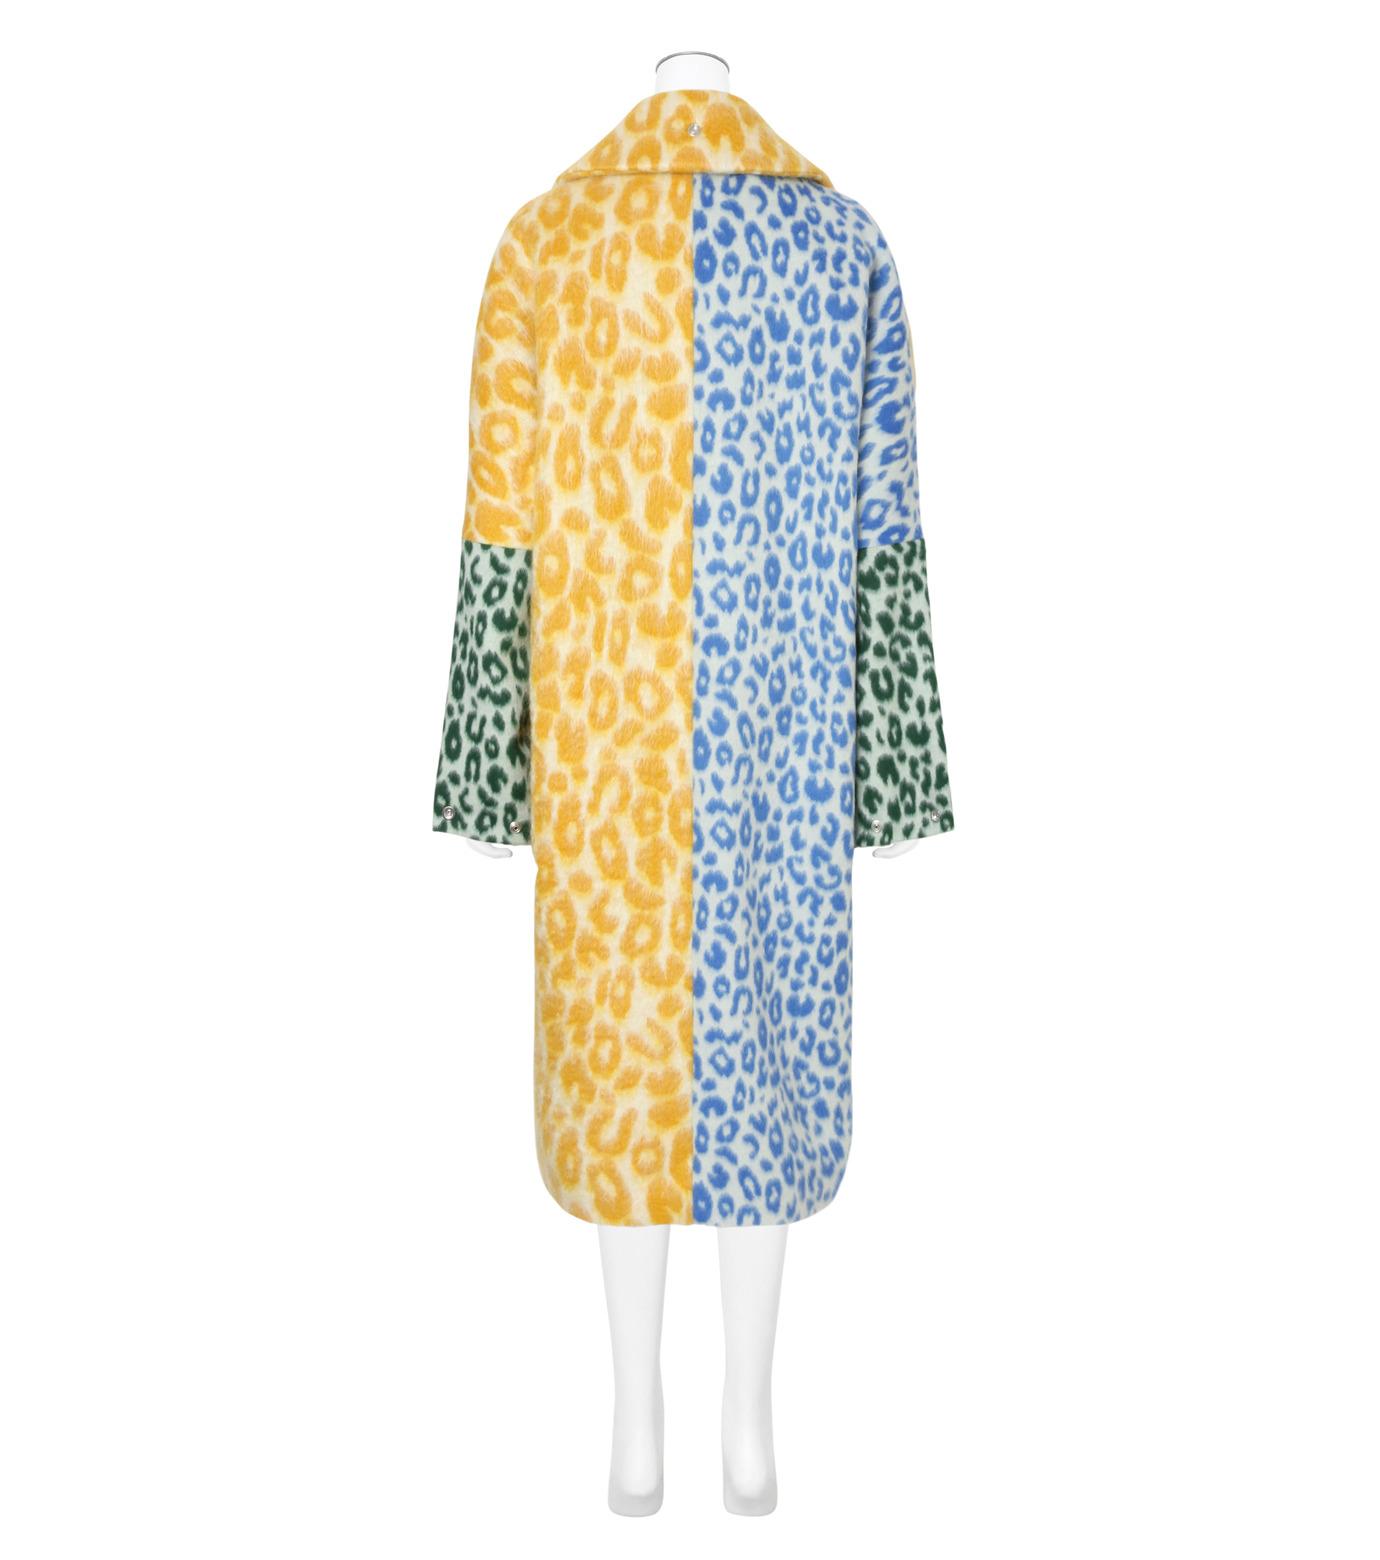 ACNE STUDIOS(アクネ ストゥディオズ)のLeopard Multicolor Coat-MULTI COLOUR(コート/coat)-12Z164-9 拡大詳細画像2